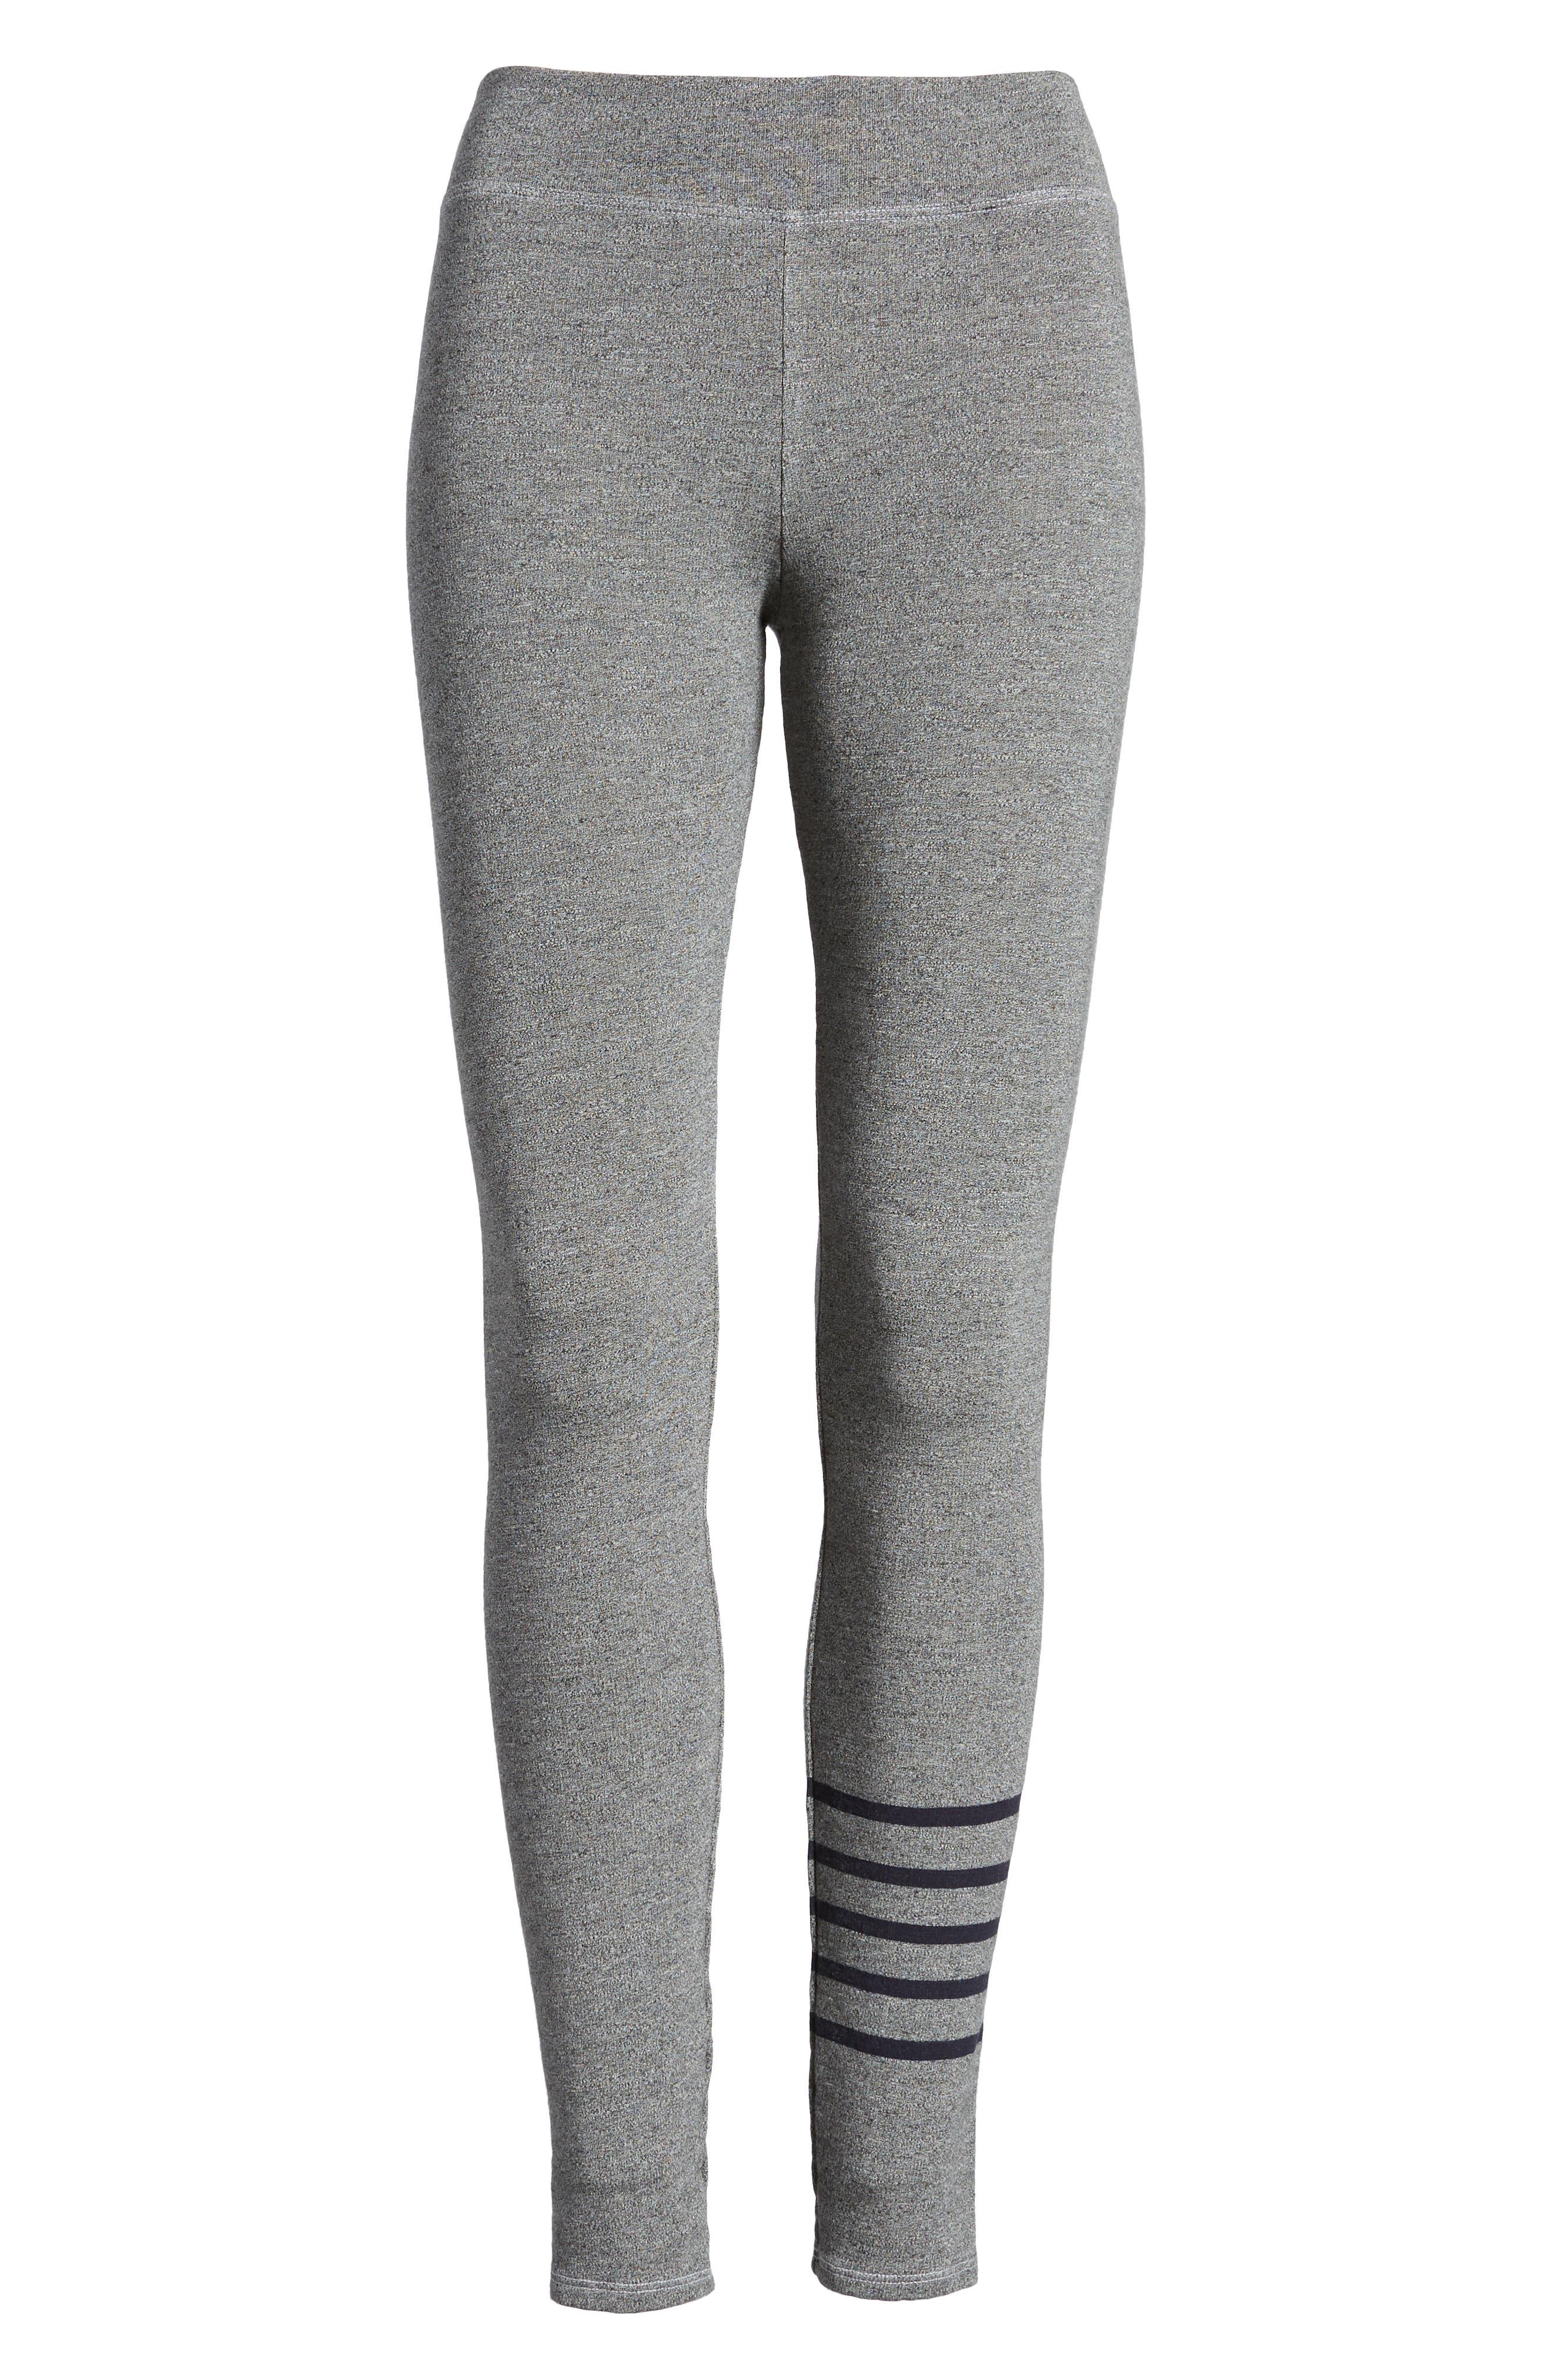 Stripe Yoga Pants,                             Alternate thumbnail 7, color,                             Heather Grey